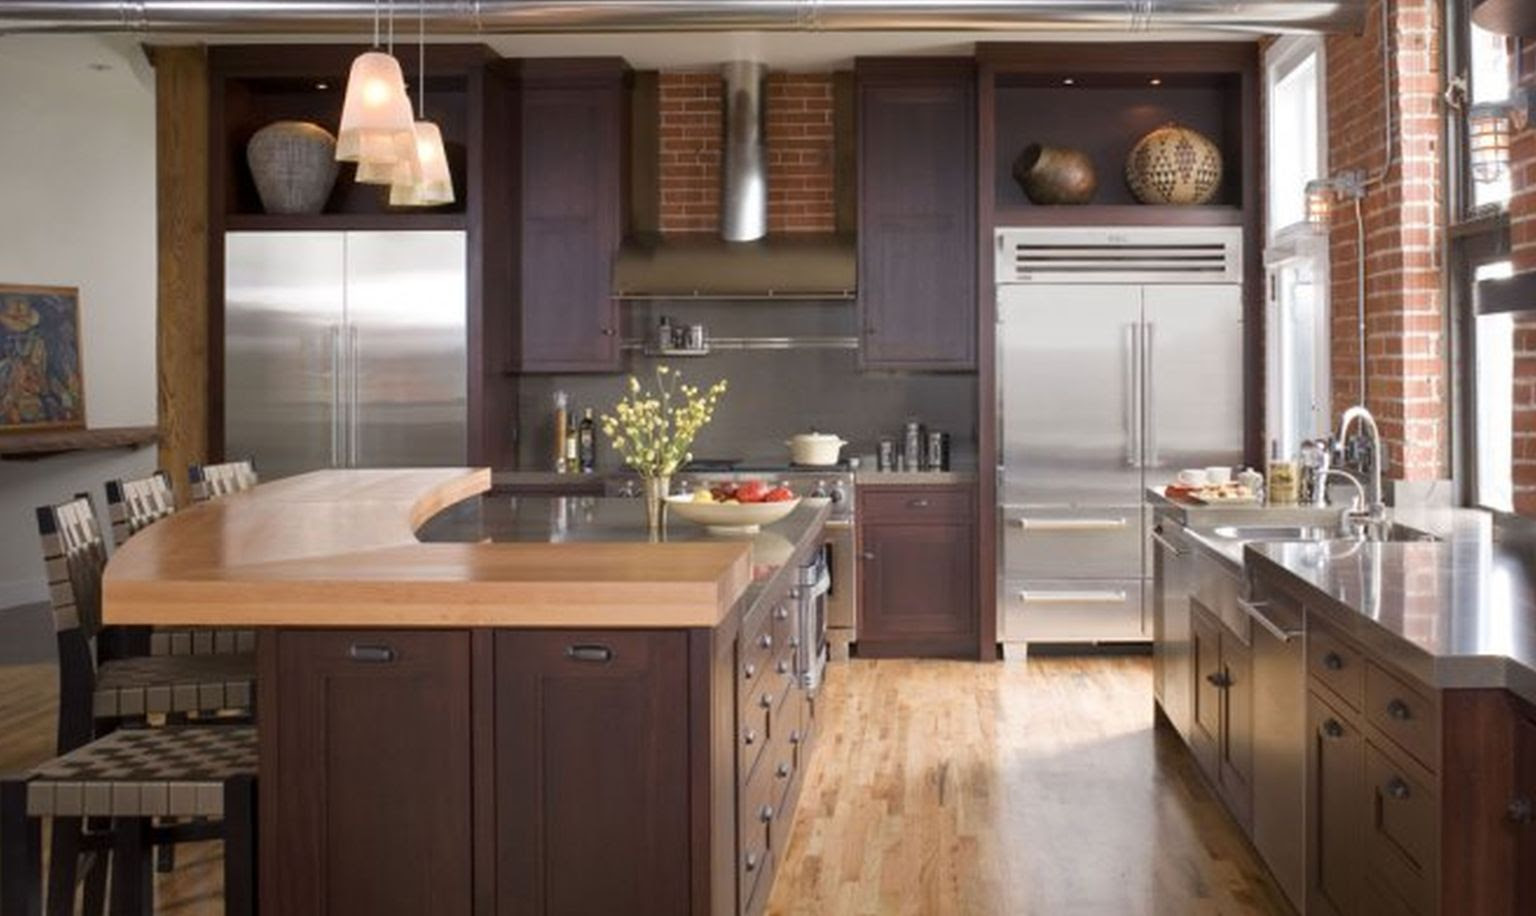 Home Depot Kitchen Design Tool - HomesFeed